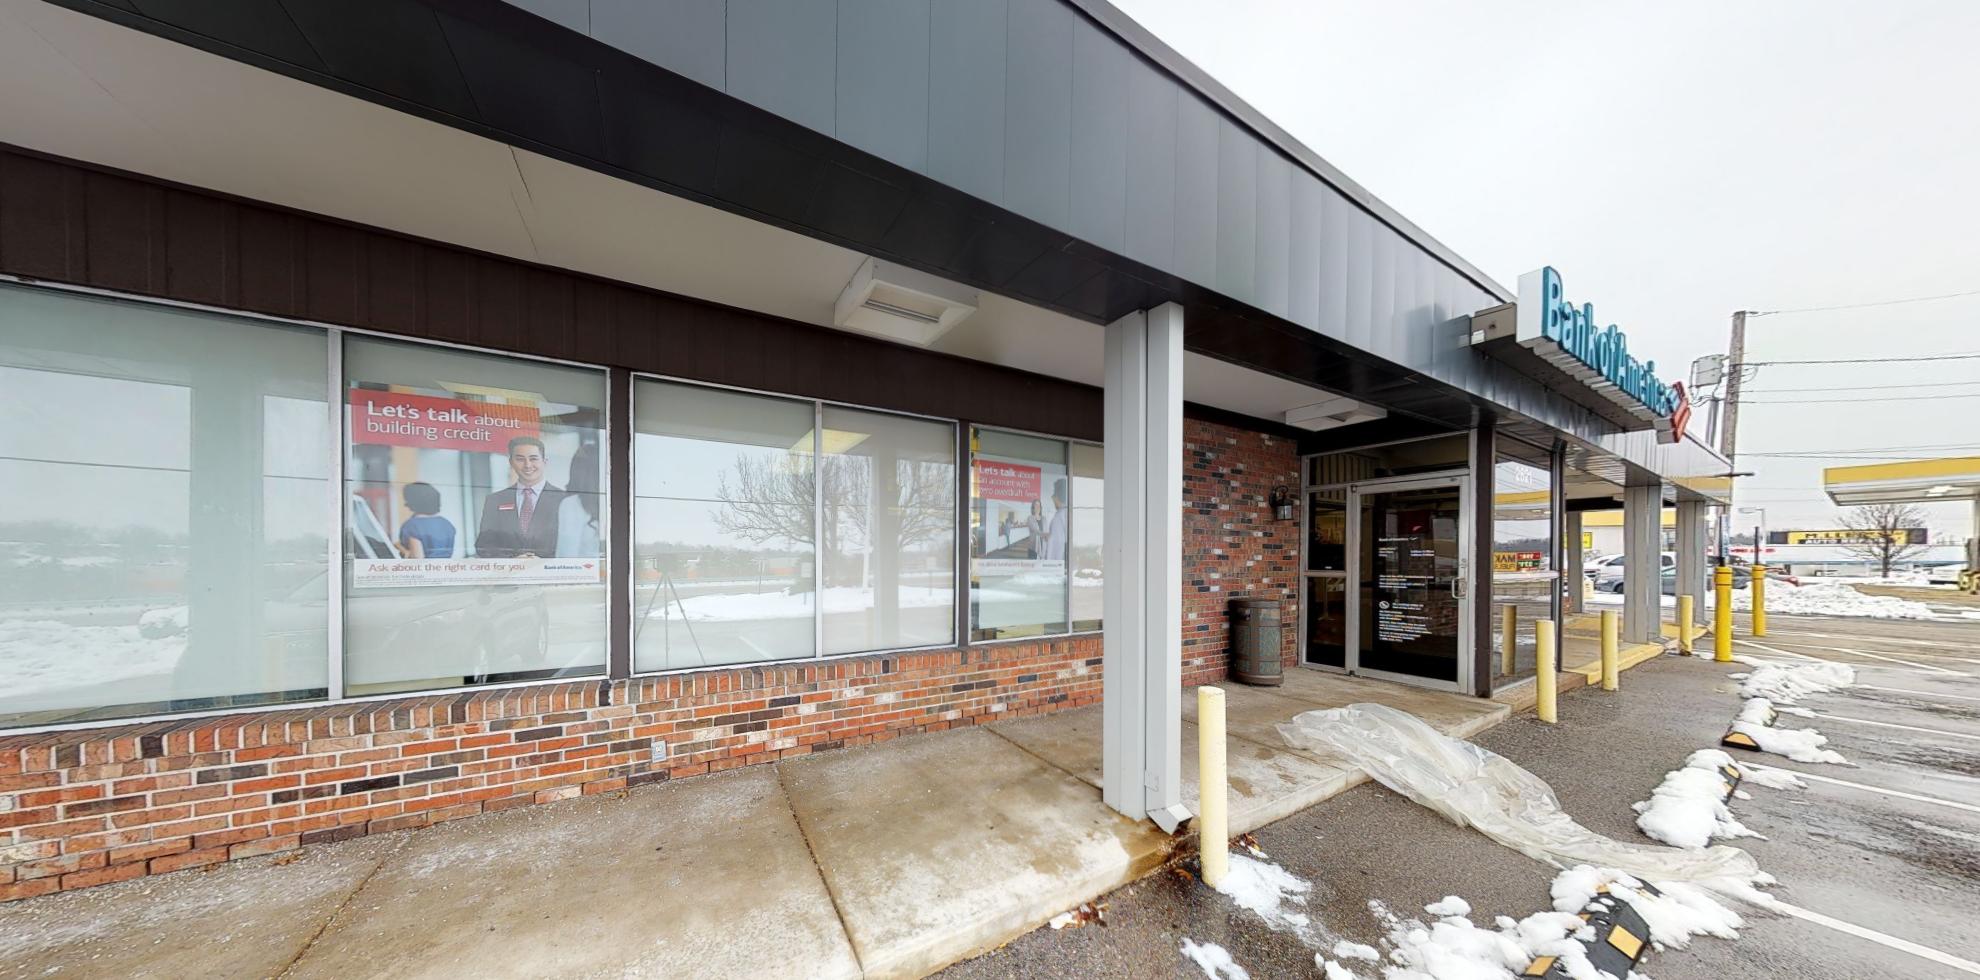 Bank of America financial center with drive-thru ATM   2621 Dunn Rd, Saint Louis, MO 63136